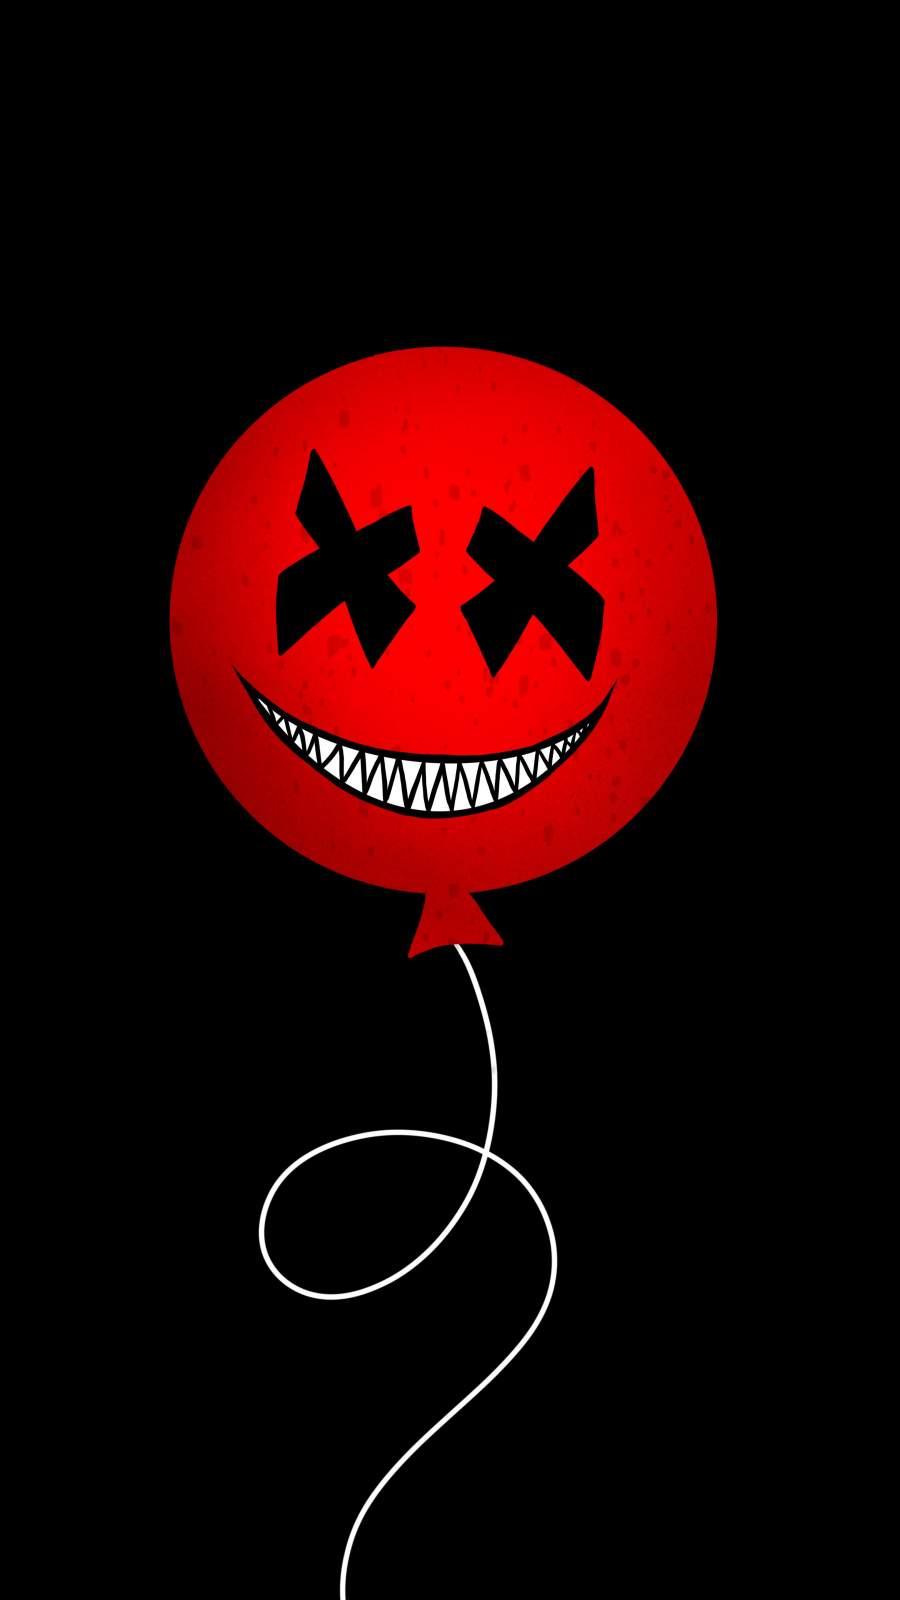 Evil Balloon iPhone Wallpaper